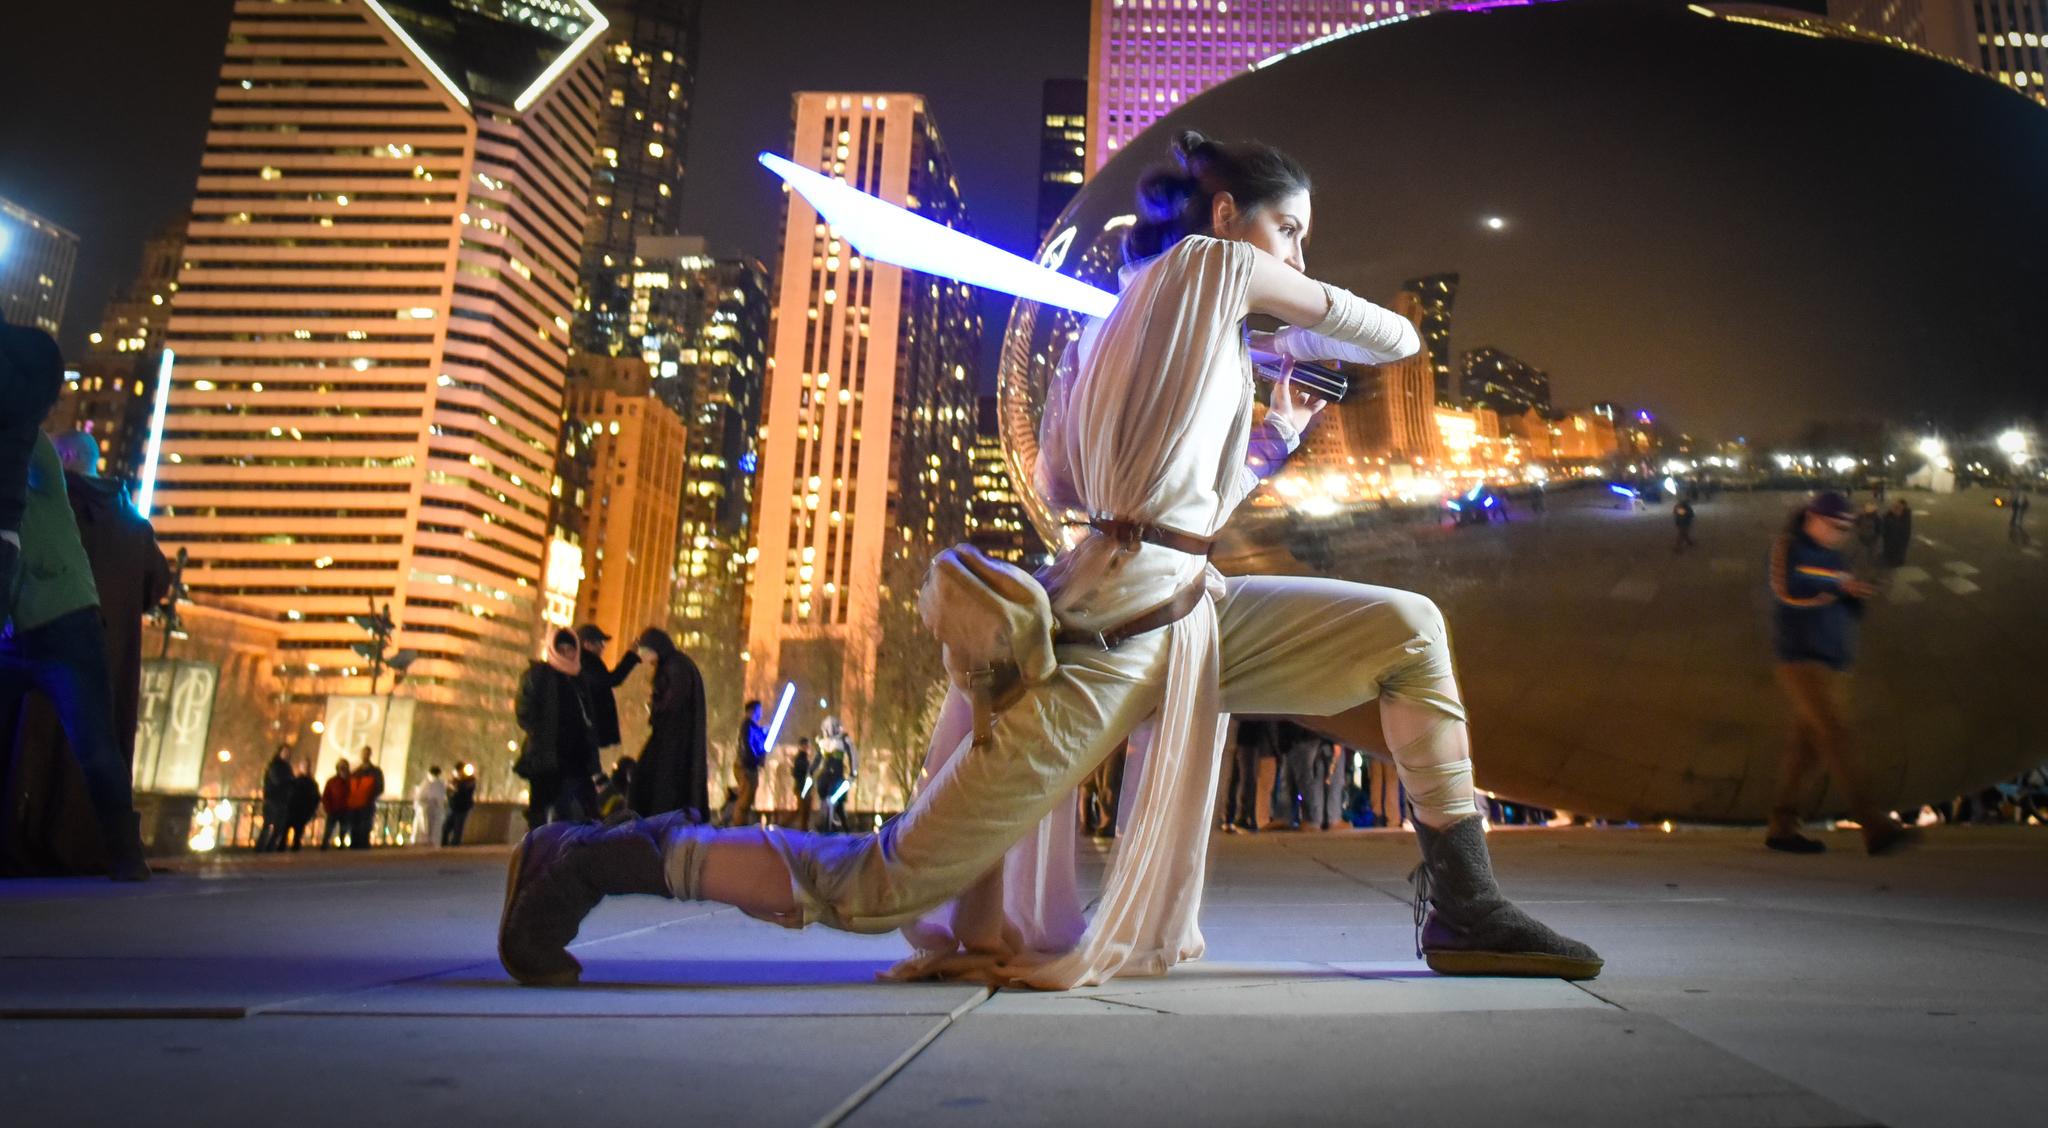 2019.04.14 - Star Wars Celebration Chicago 288914.JPG